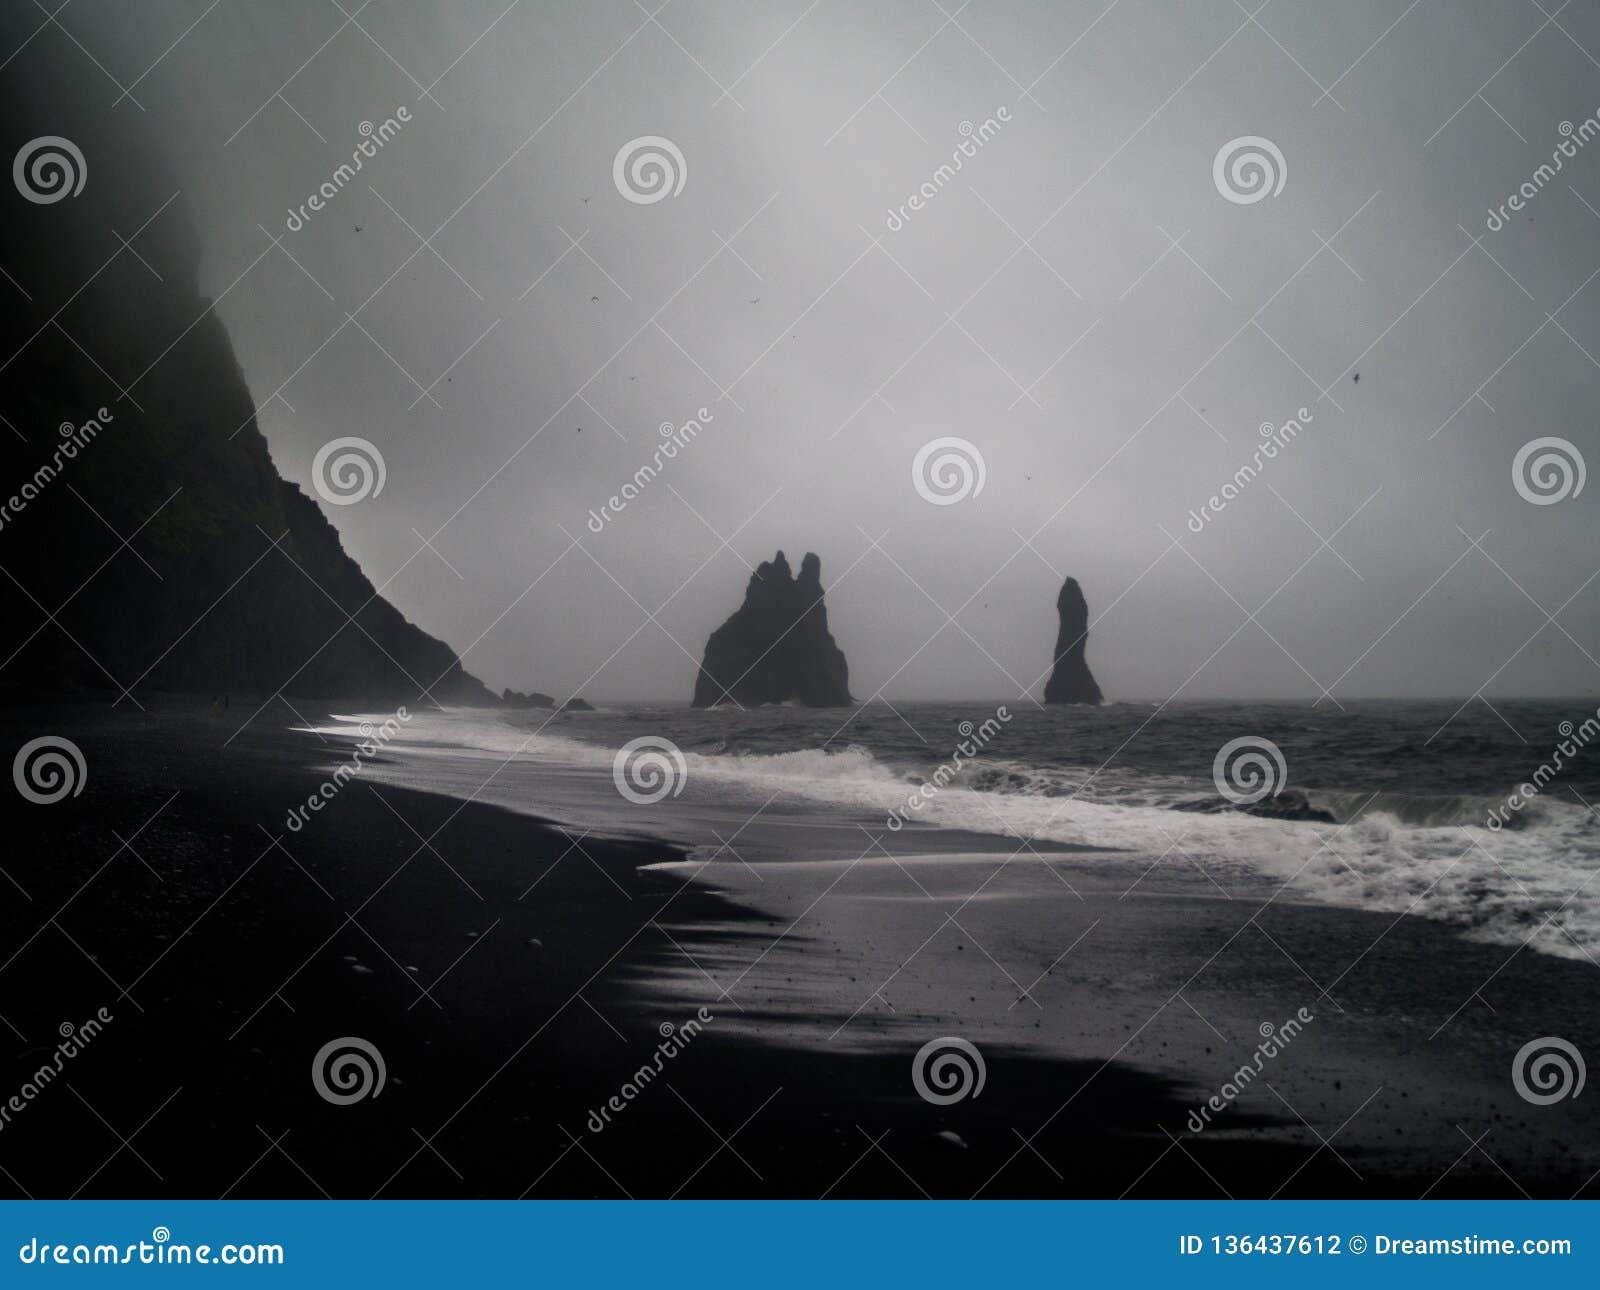 THe Reynisfjara columns from the famous Black Beach Reynisfjara Beach of Iceland